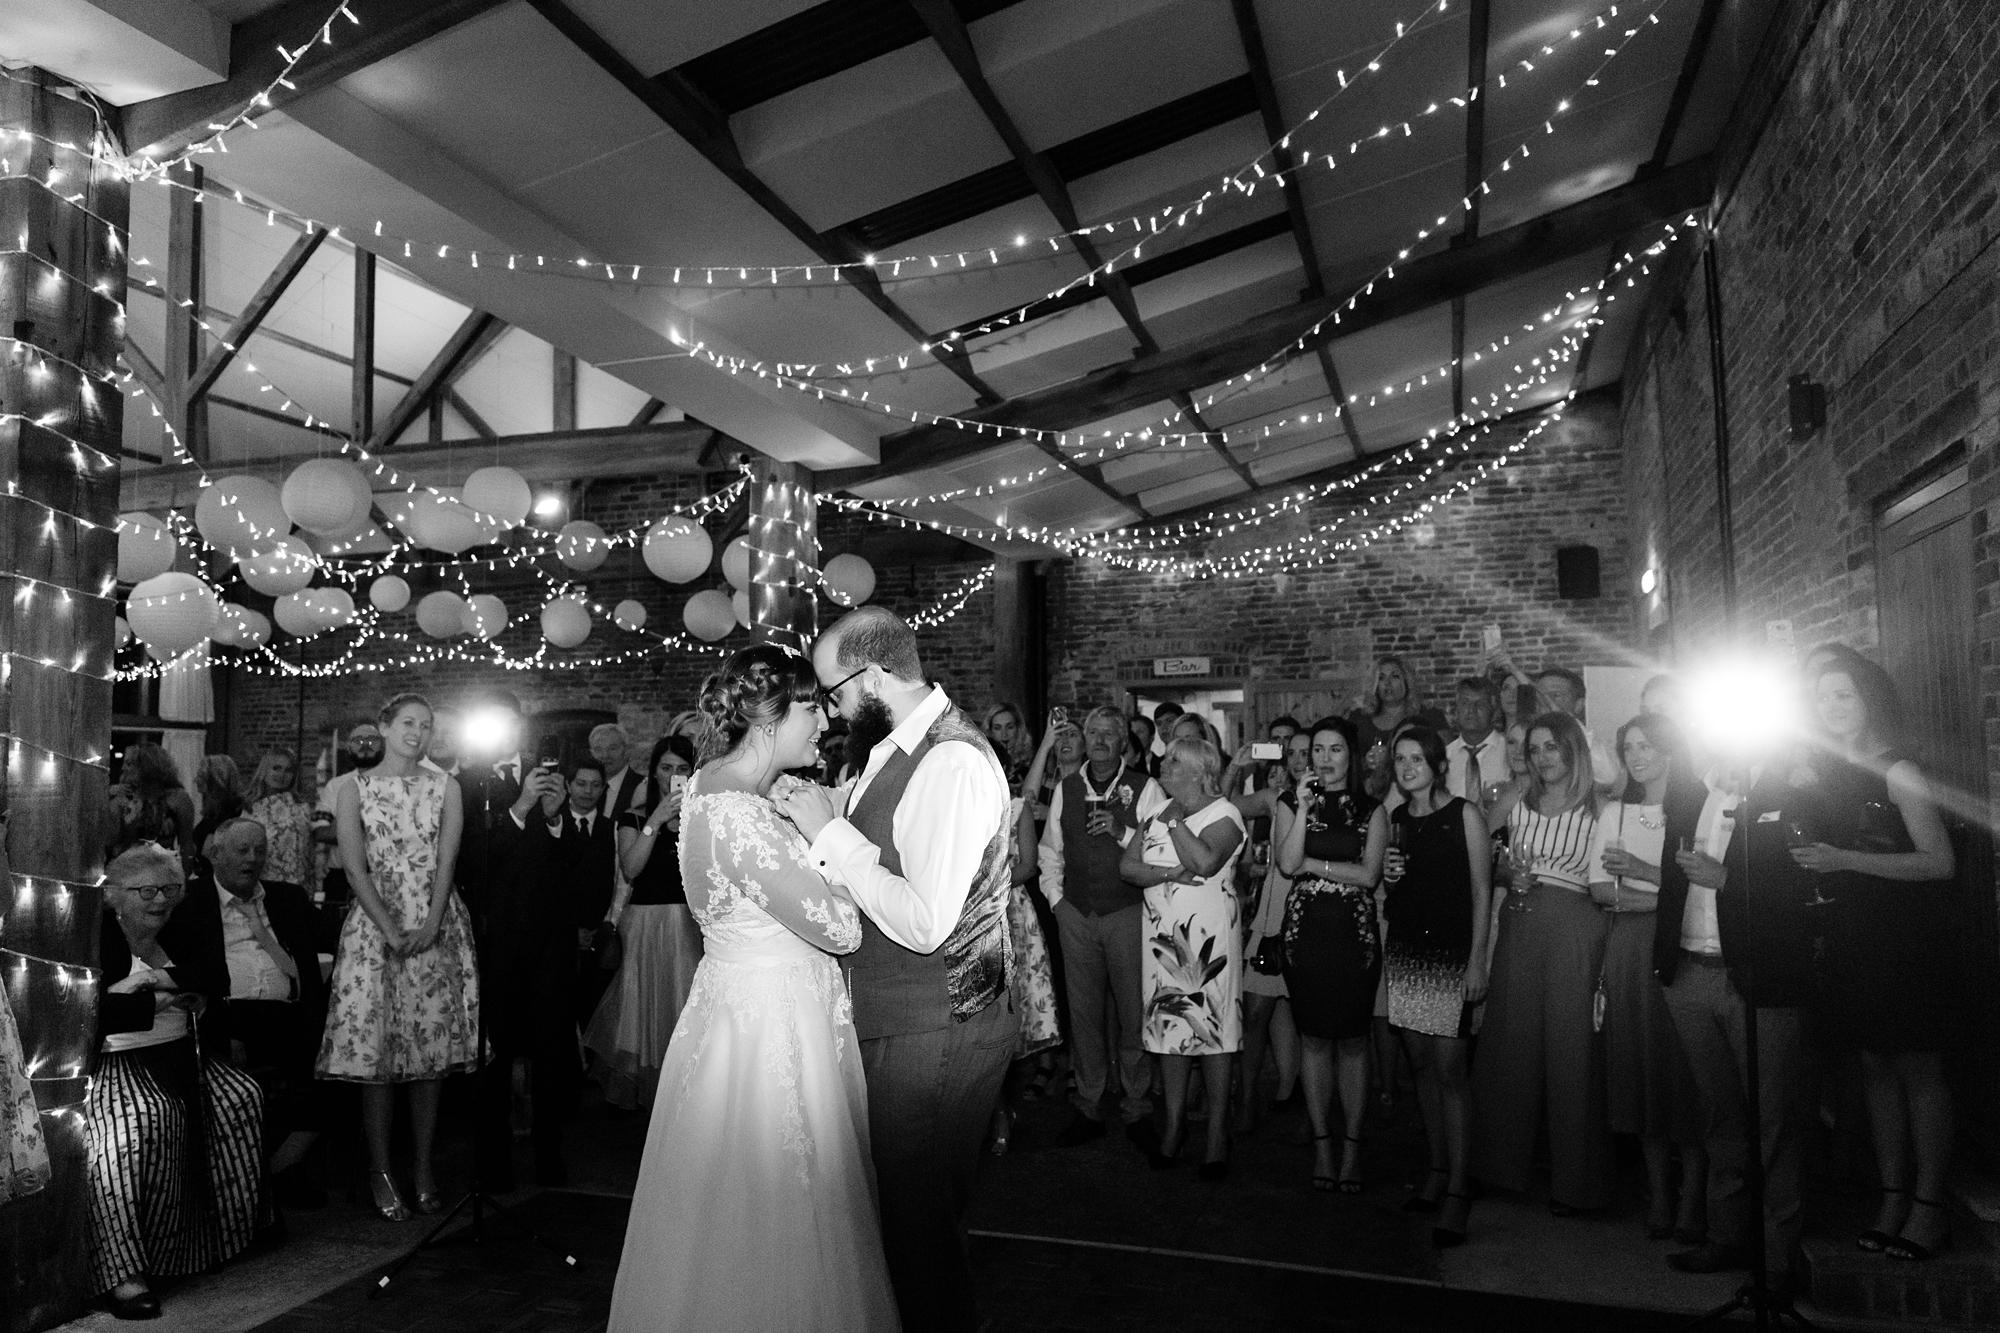 York Wedding Photography at Barmbyfield Barns Frist Dance